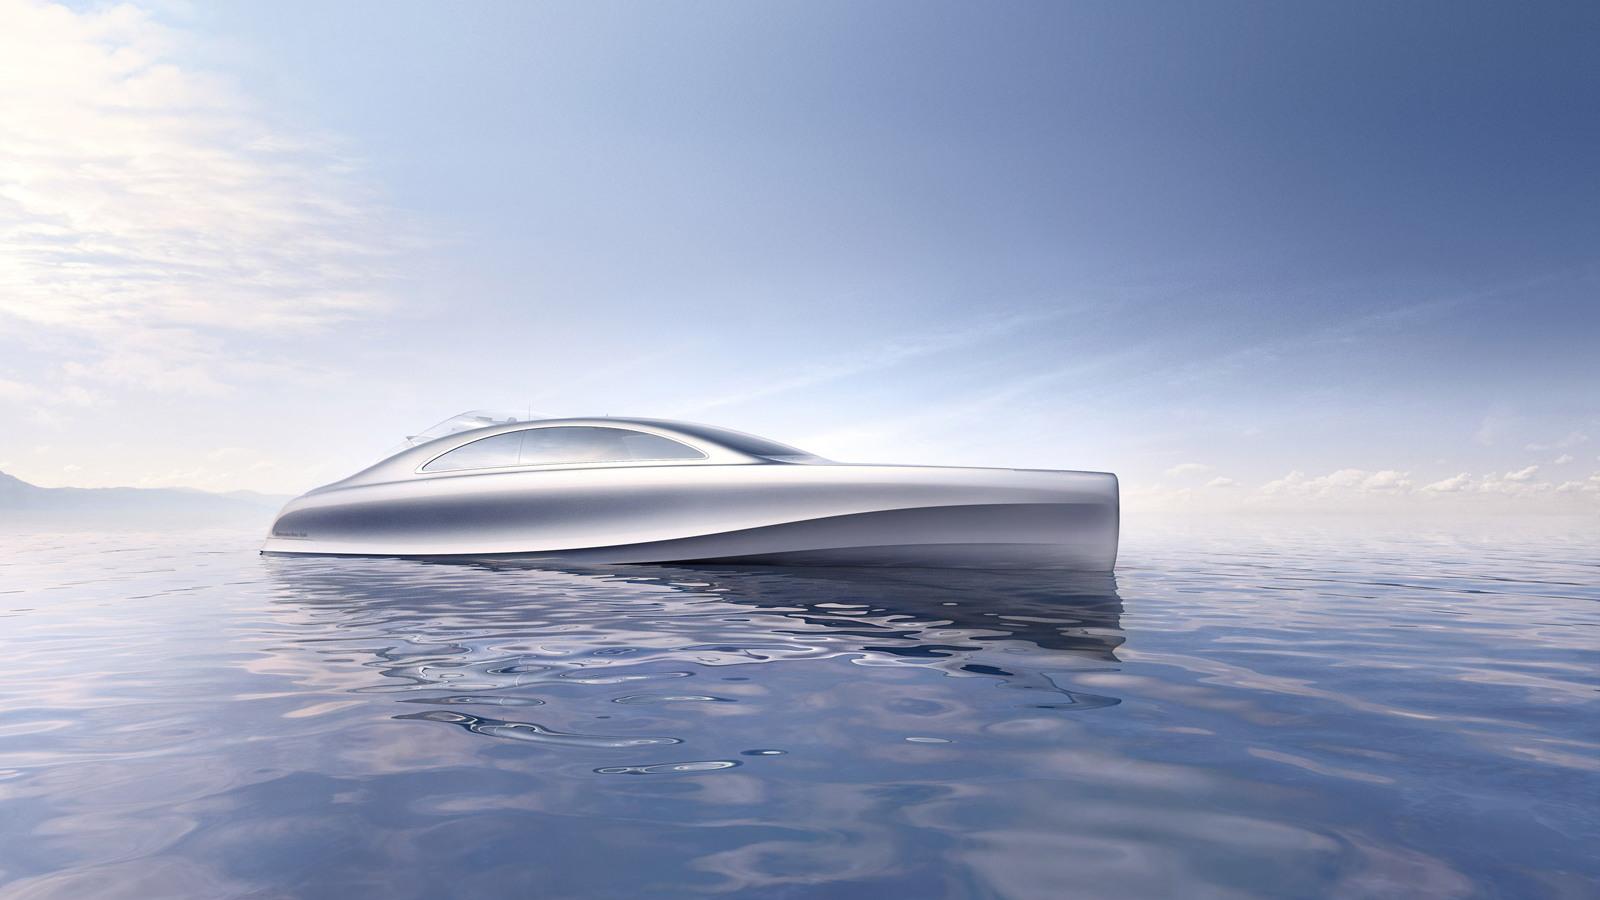 Mercedes-Benz Arrow460 - Granturismo, 2013 Monaco Yacht Show